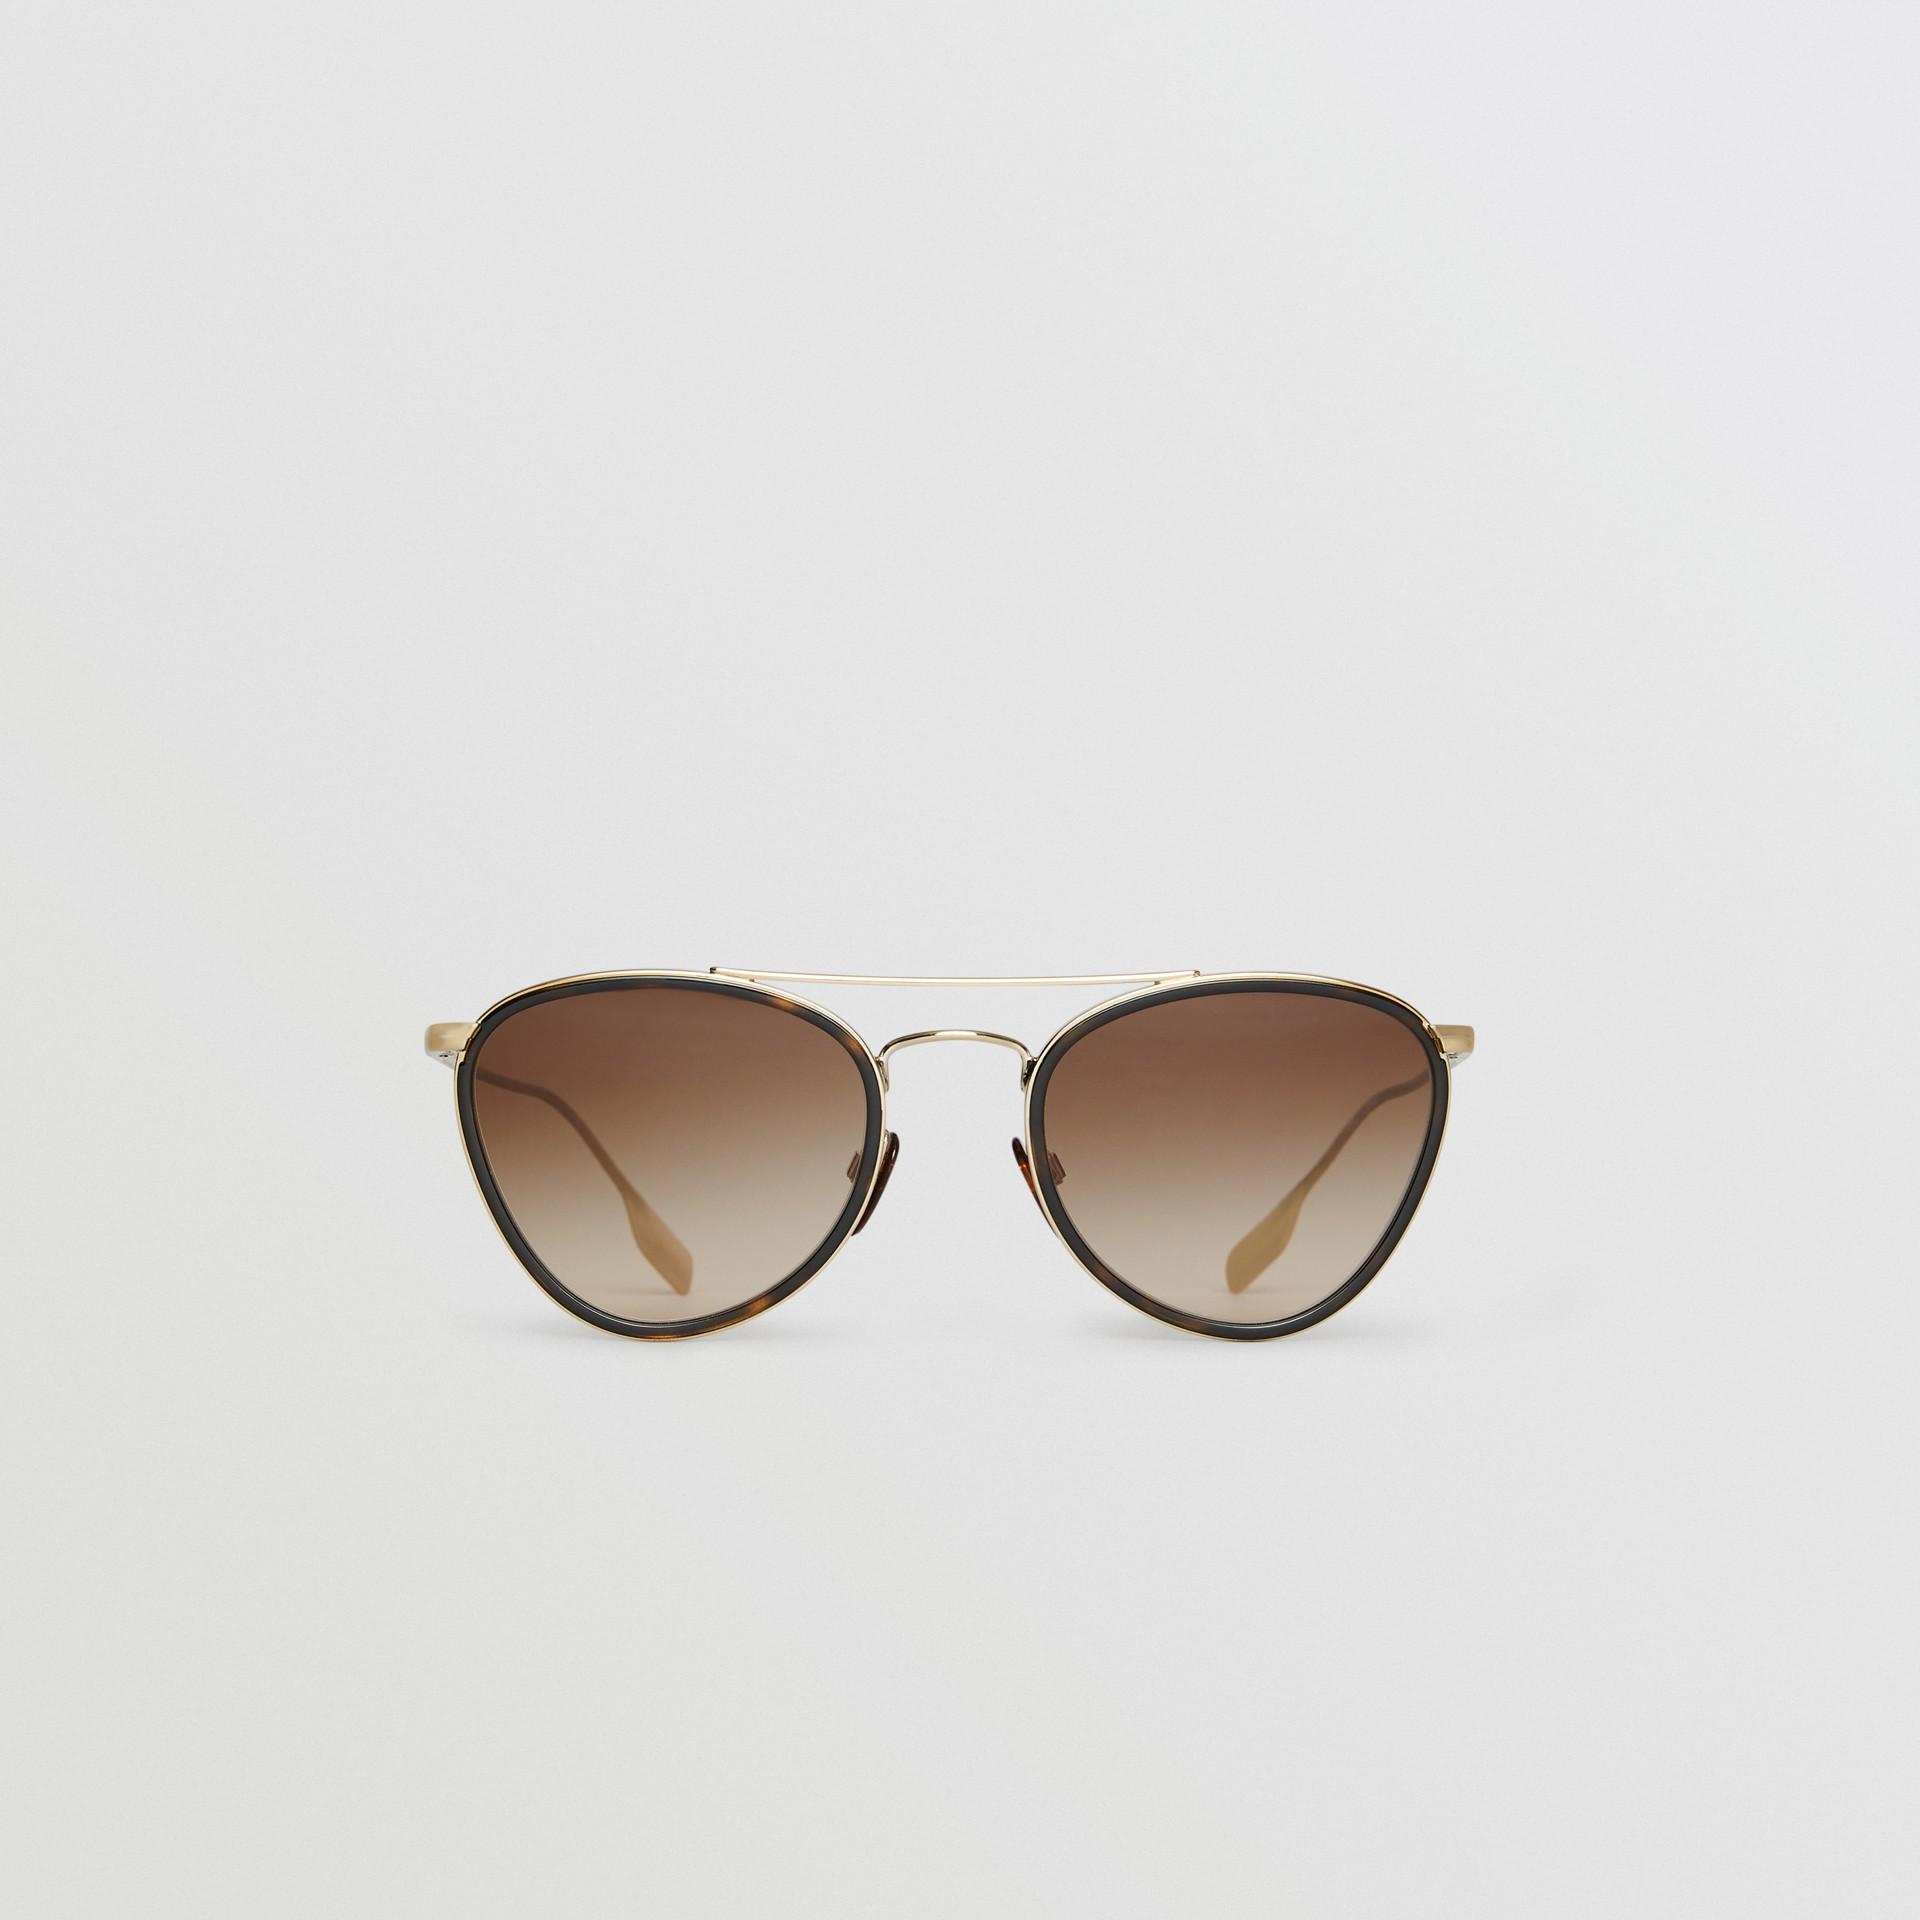 Pilot Sunglasses in Tortoise Shell - Women | Burberry - gallery image 0